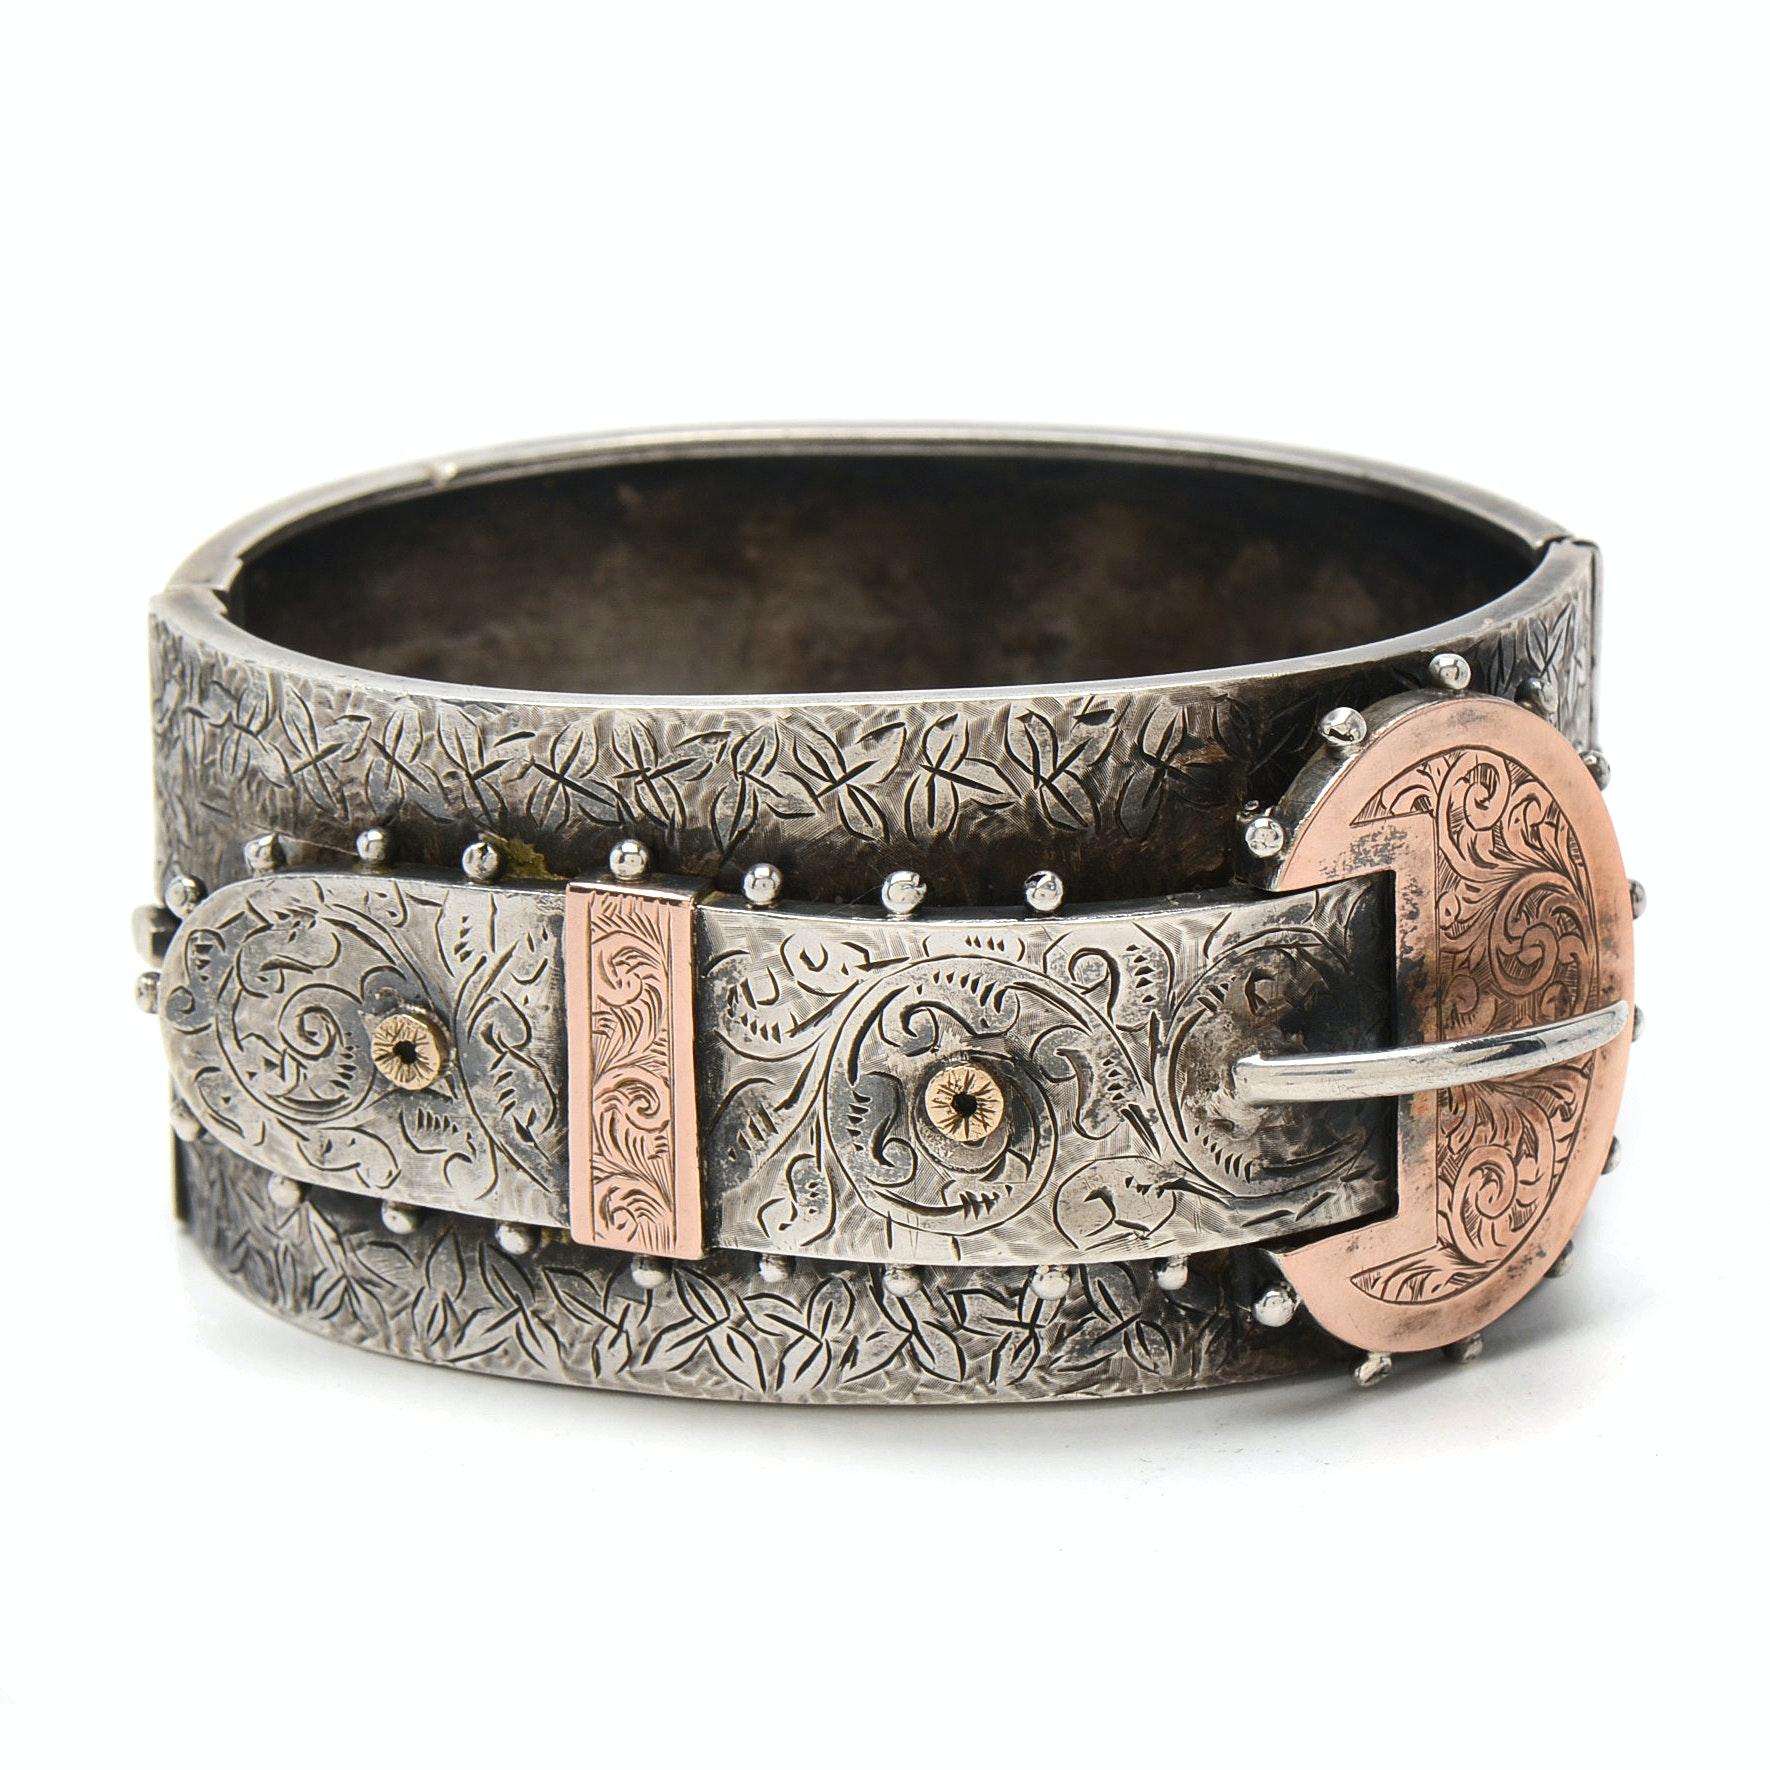 Circa 1882 English Sterling Silver Hinged Buckle Cuff